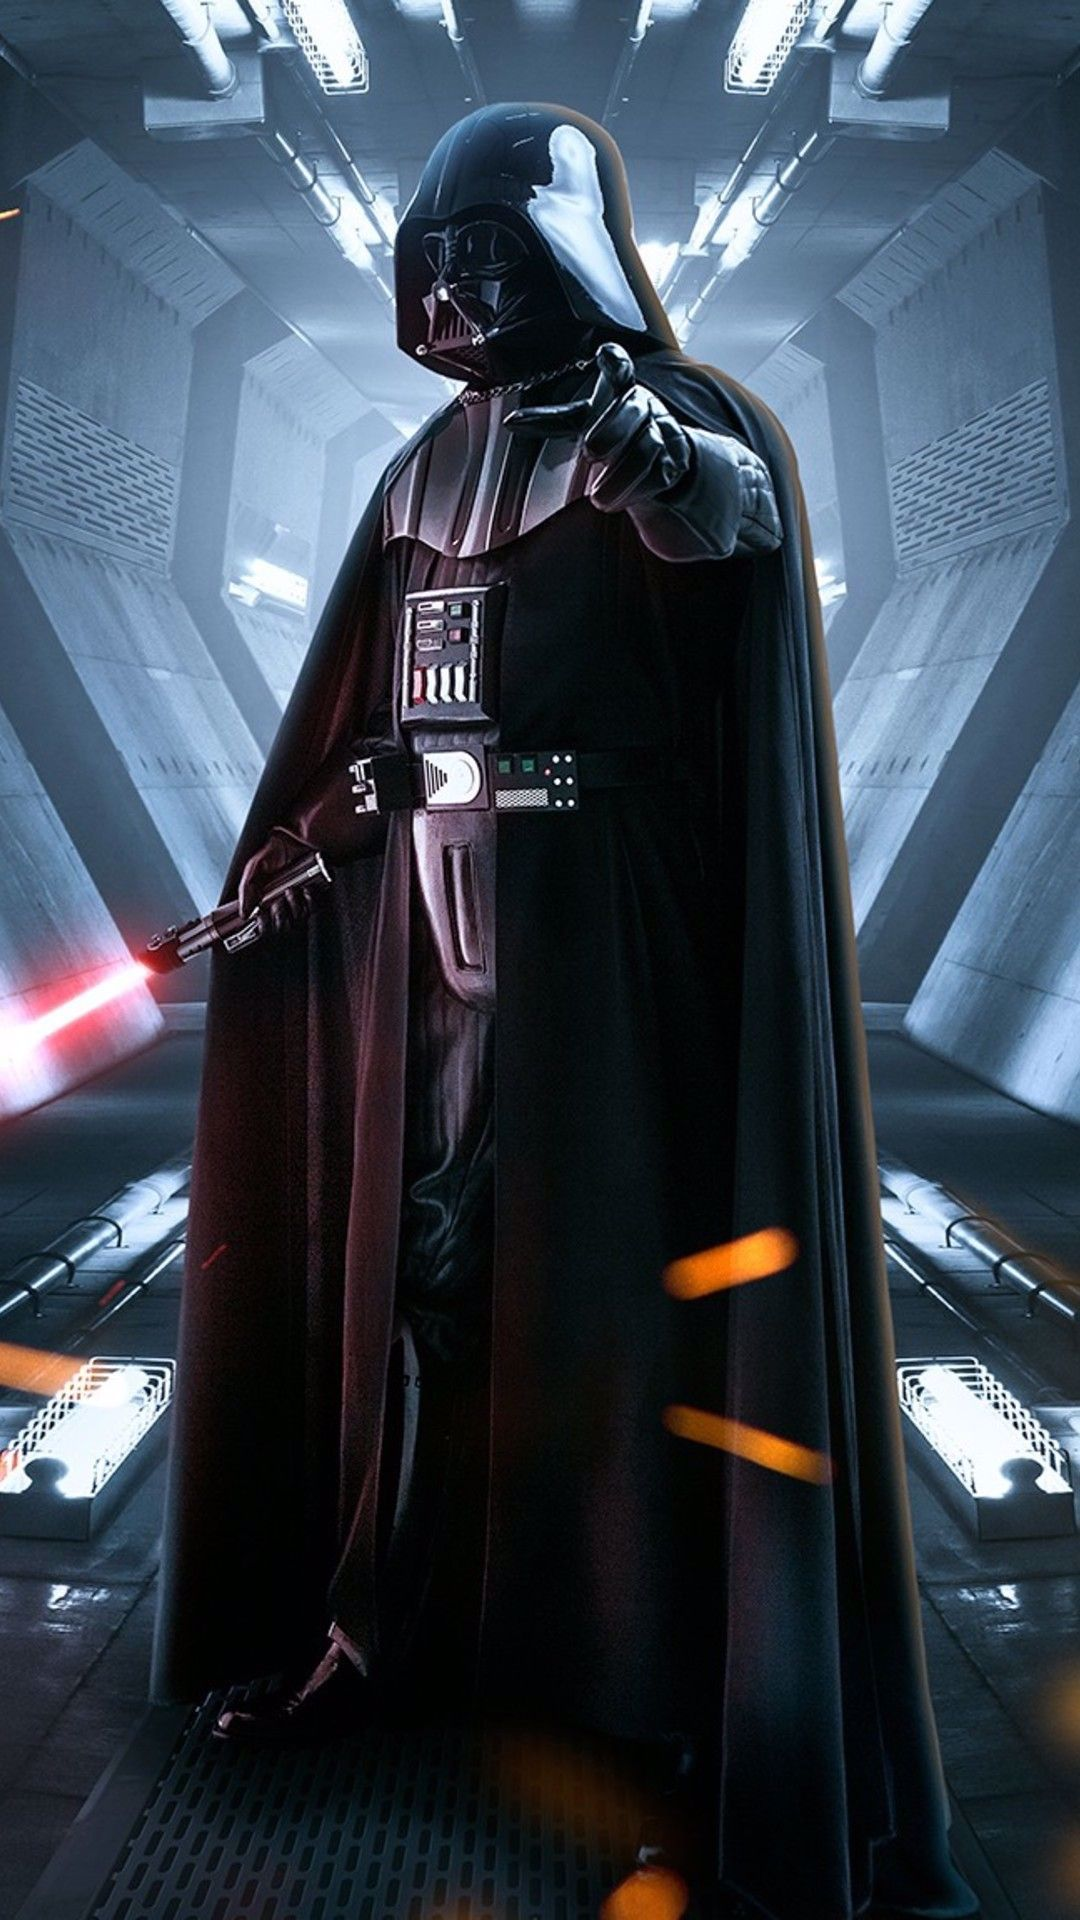 New Darth Vader I in 2020 Star wars images, Star wars